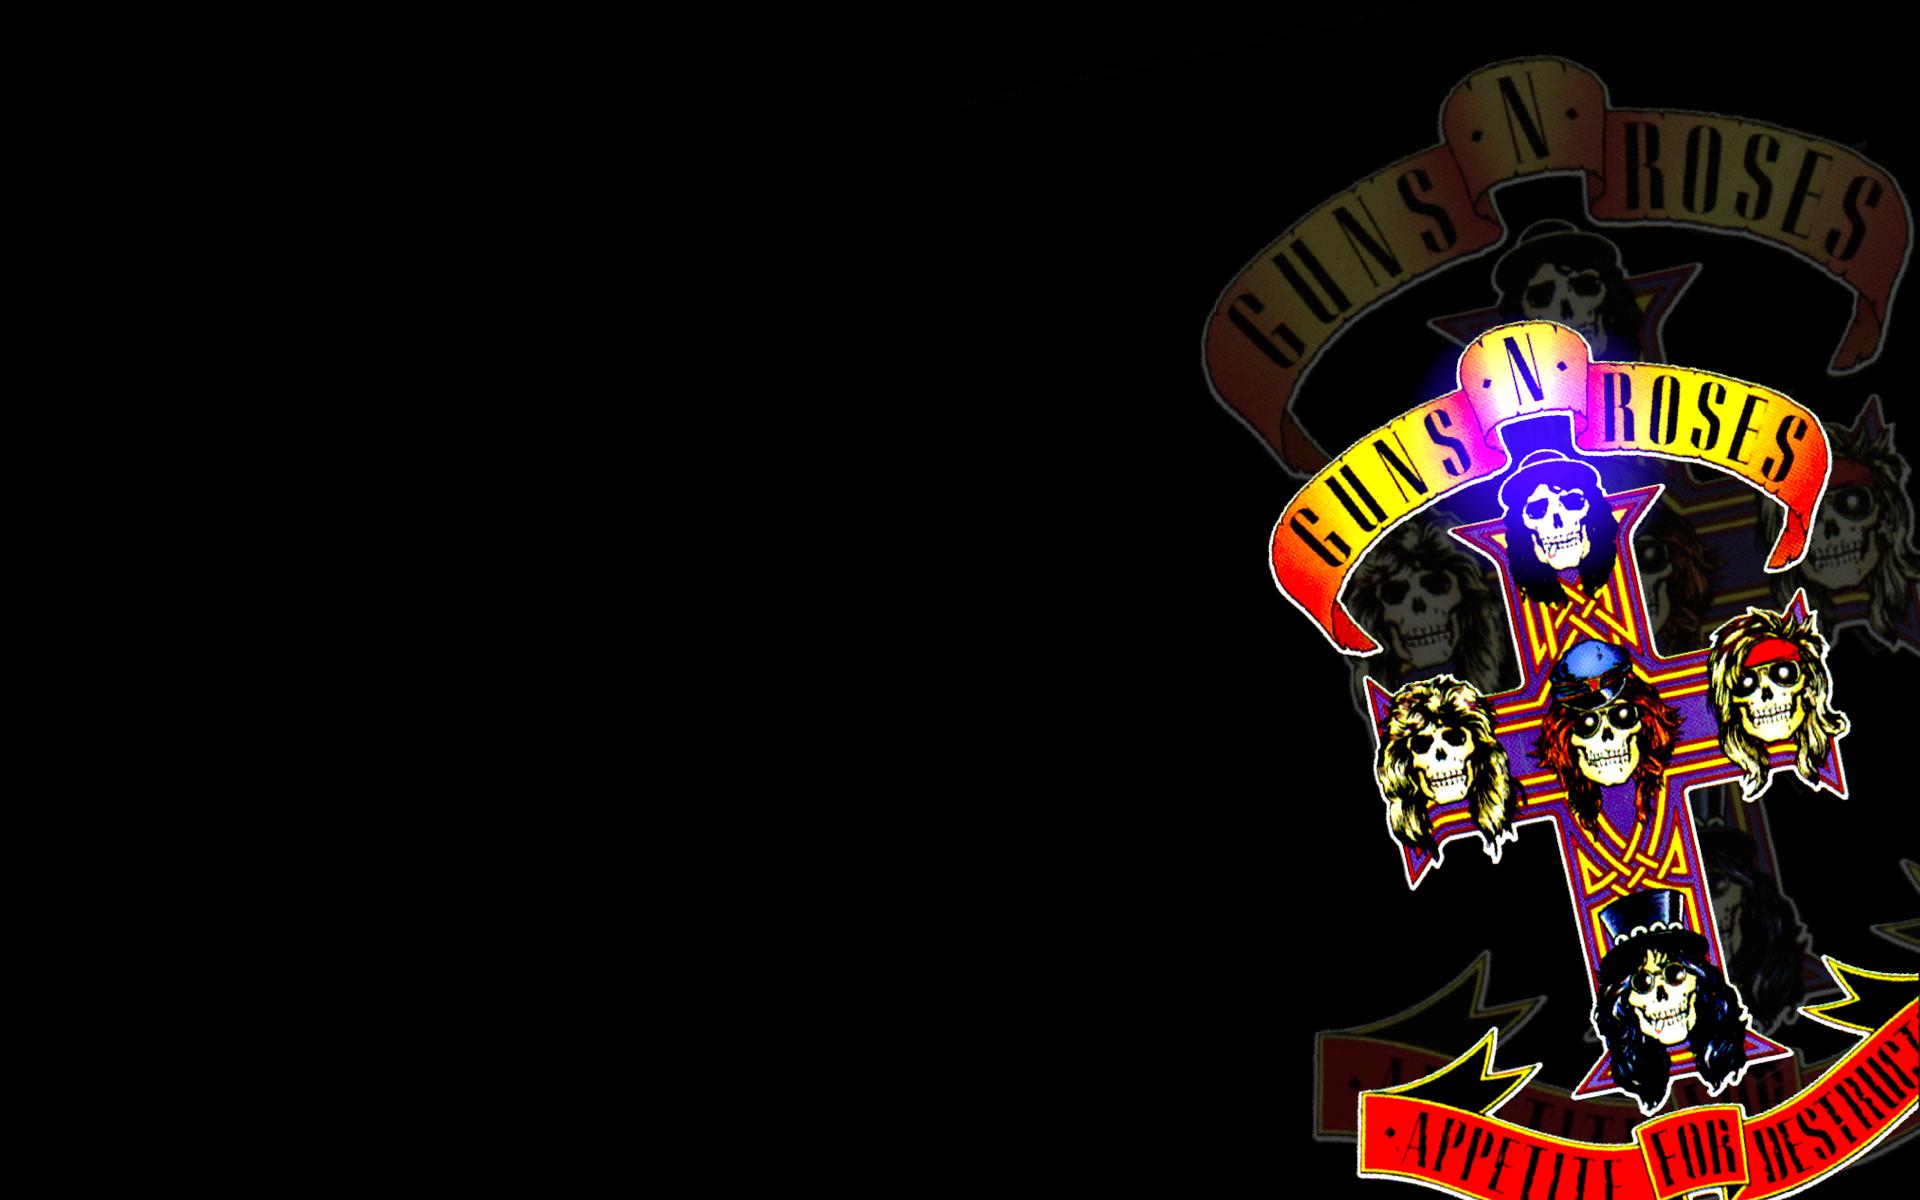 Free Download Guns And Roses Heavy Metal Glam Logo Group Band Skulls Dark Wallpaper 1920x1200 For Your Desktop Mobile Tablet Explore 75 Guns N Roses Wallpaper Guns Screensavers And